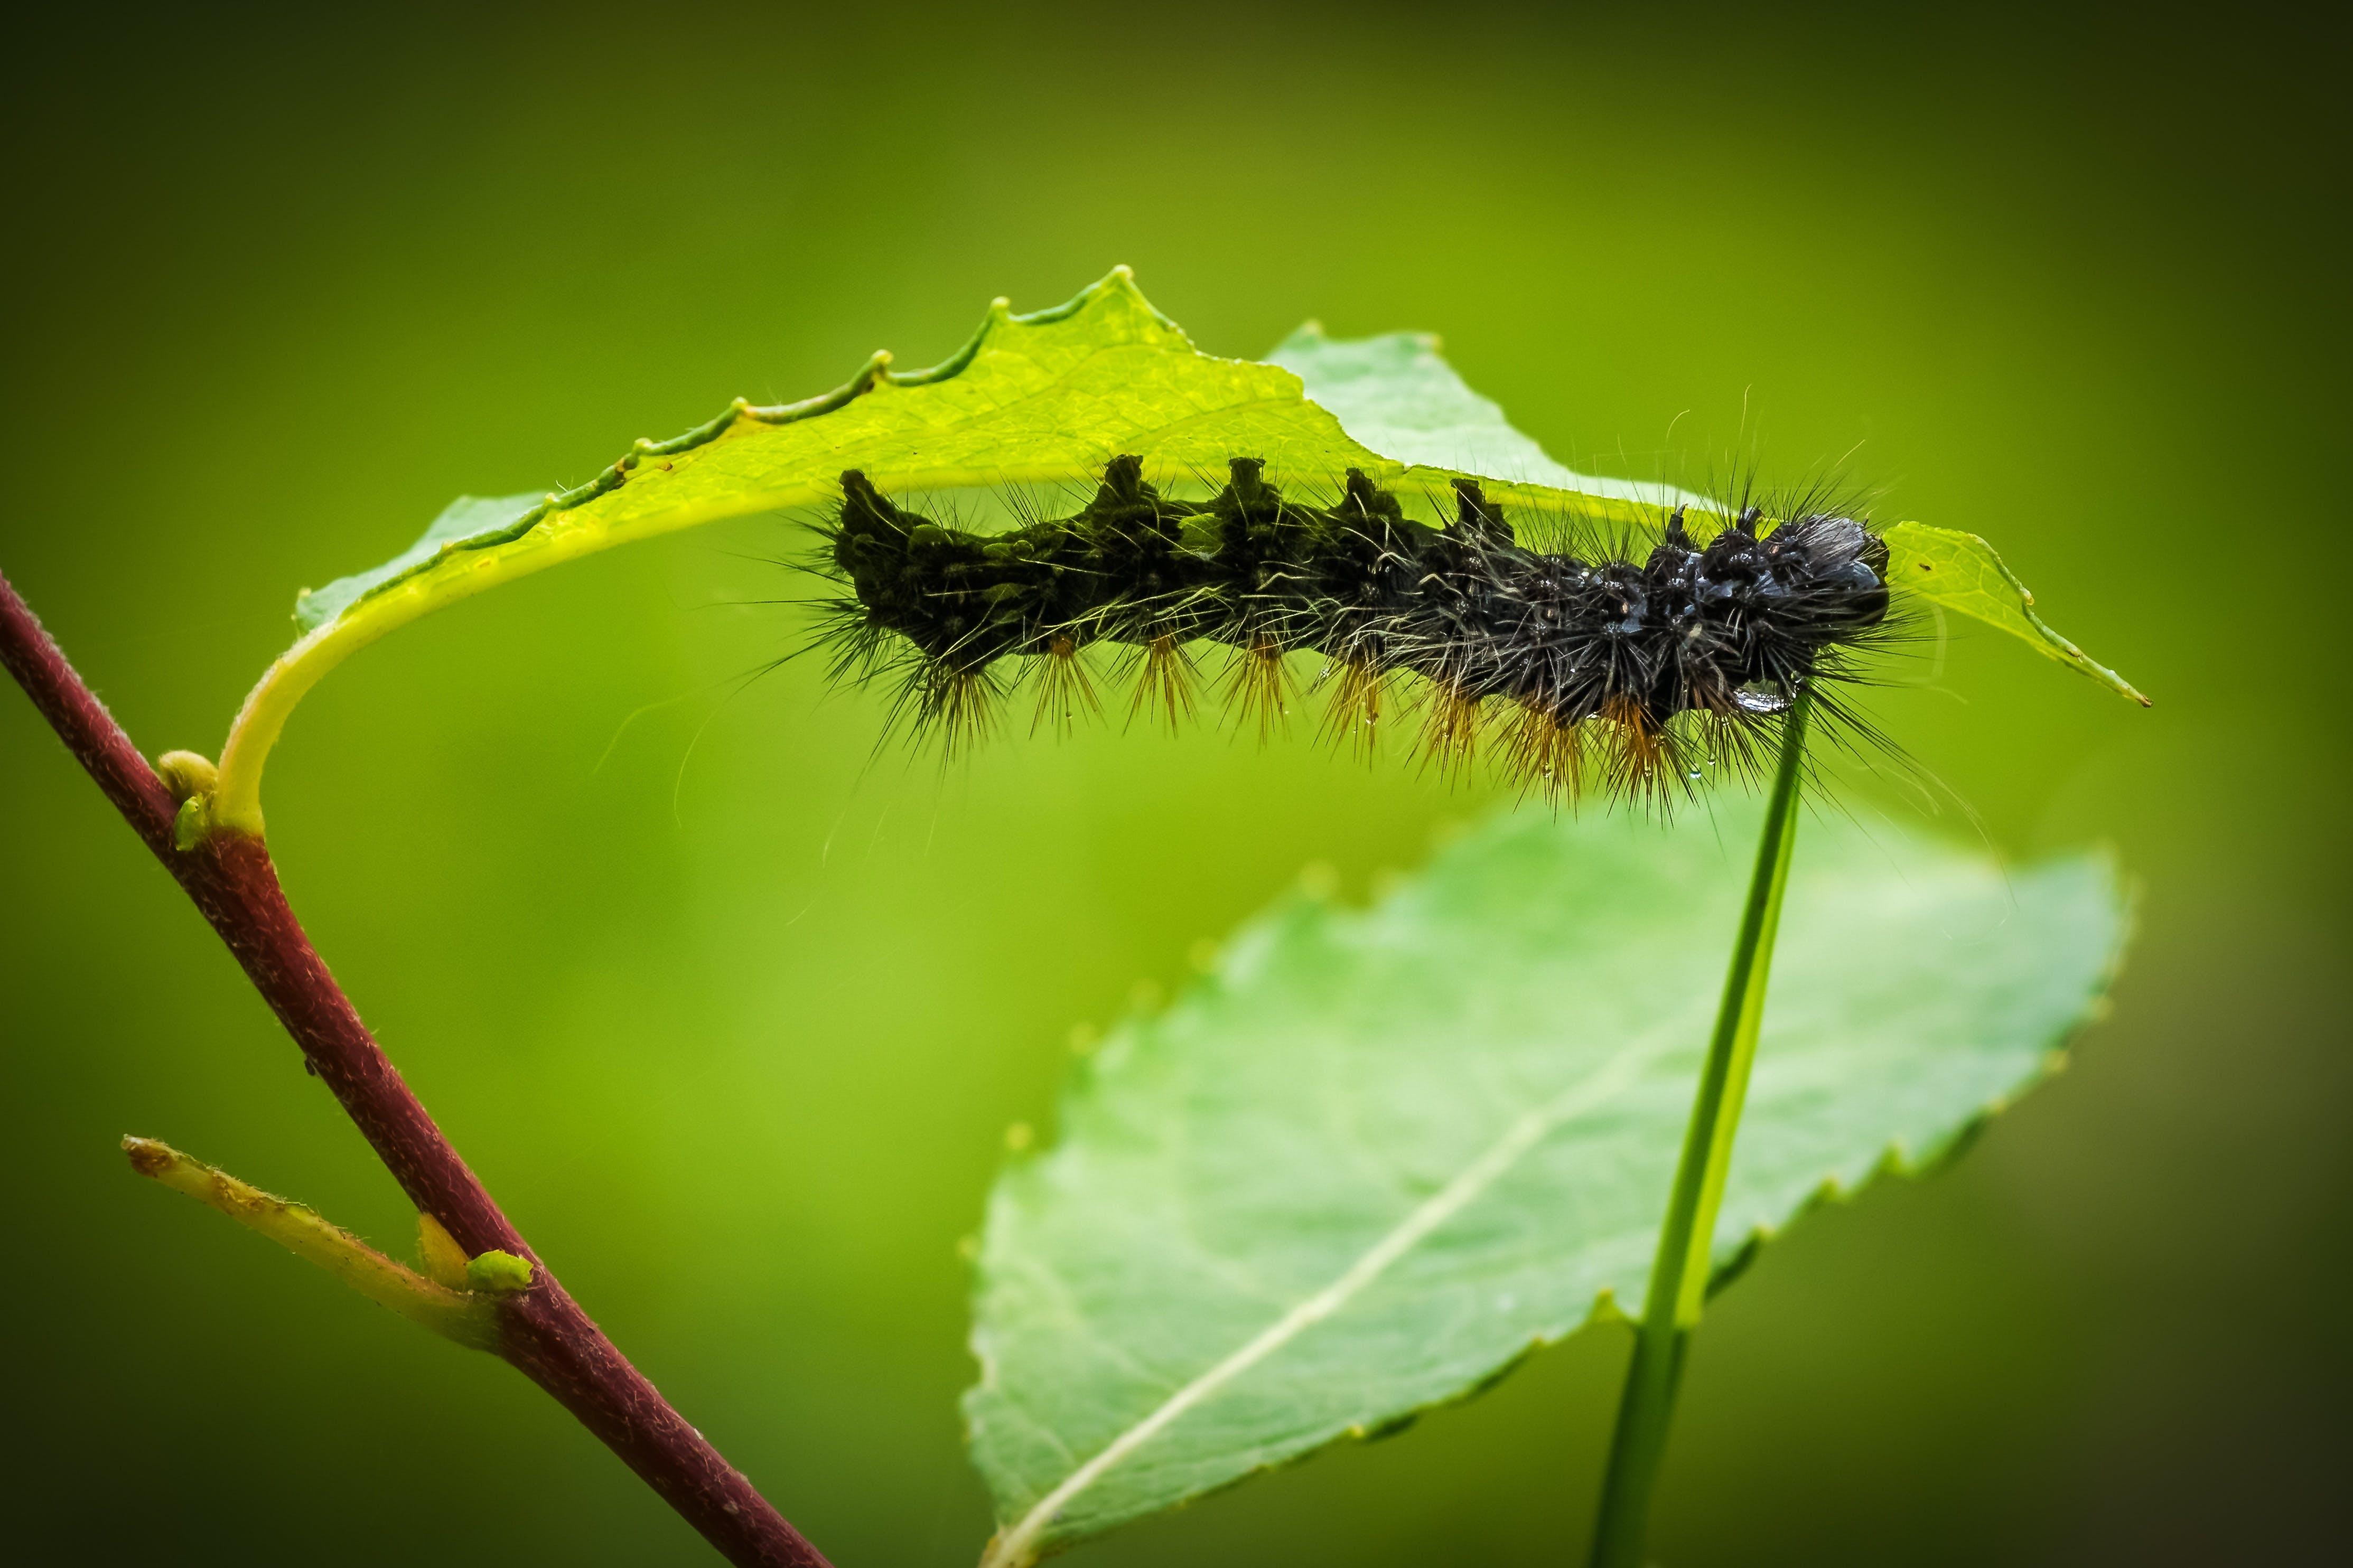 Black Moth on Green Leaf Plant